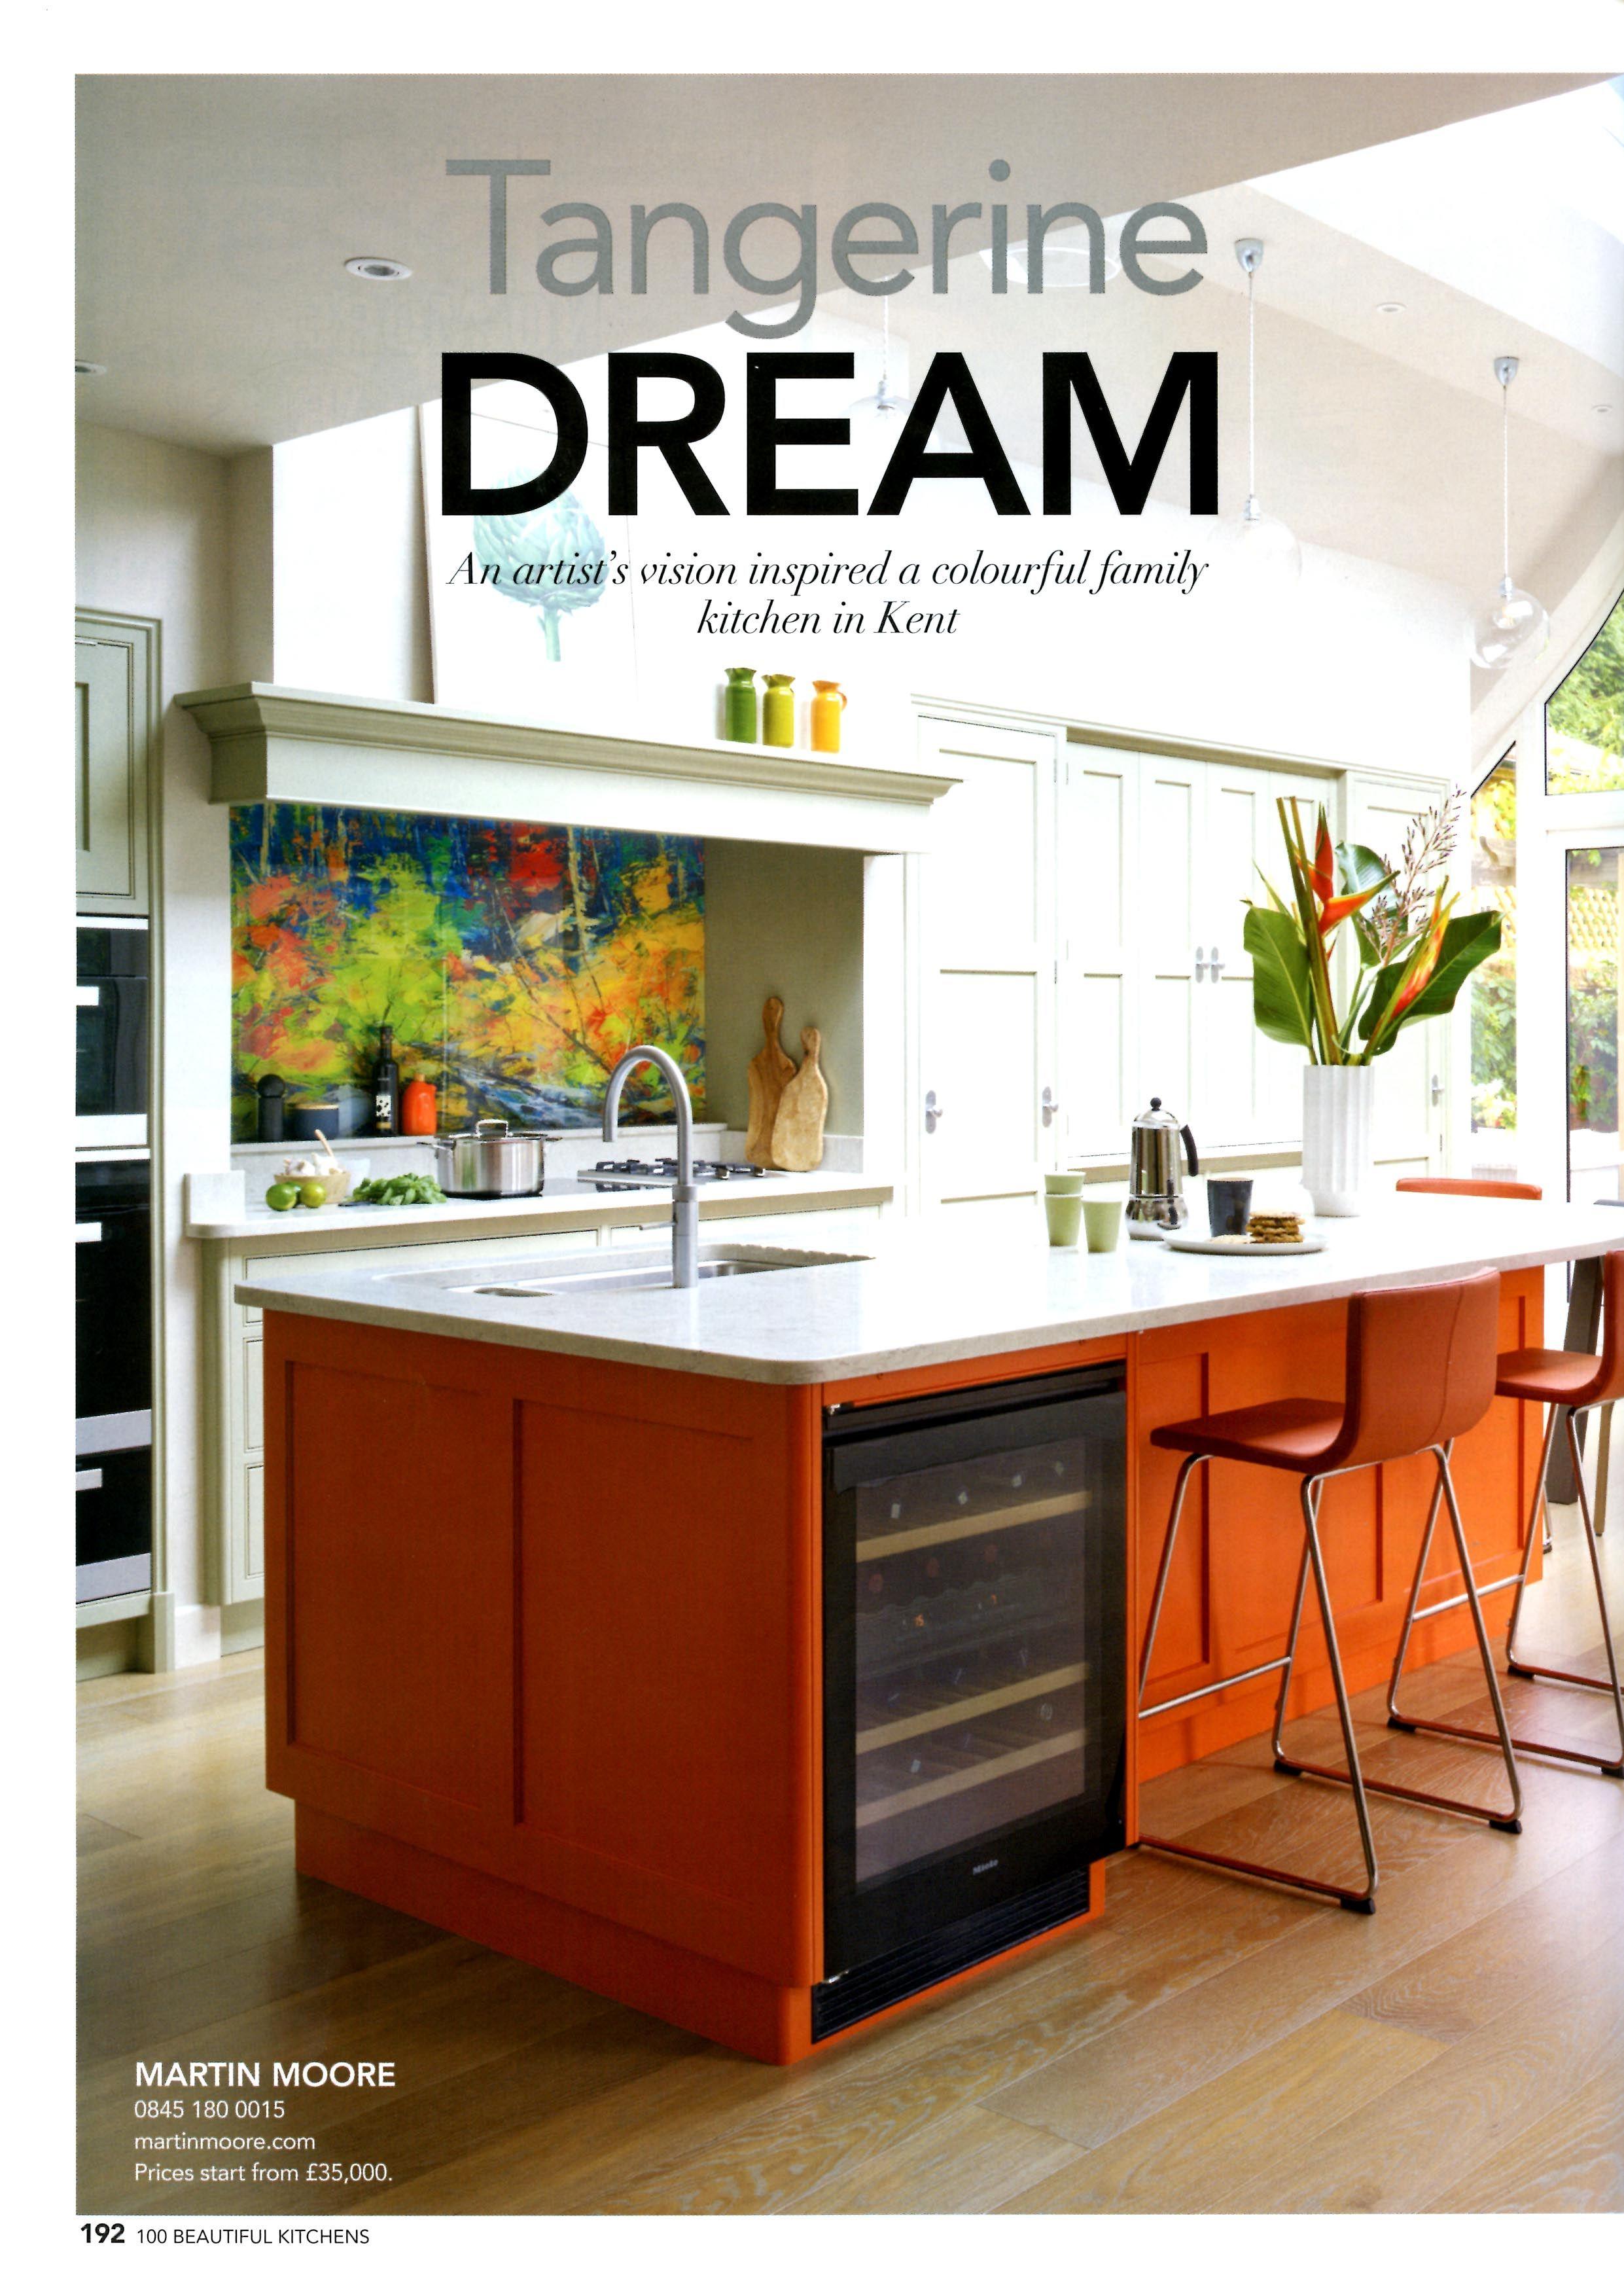 Tangerine Dream: An Artist's vision inspired a colourful